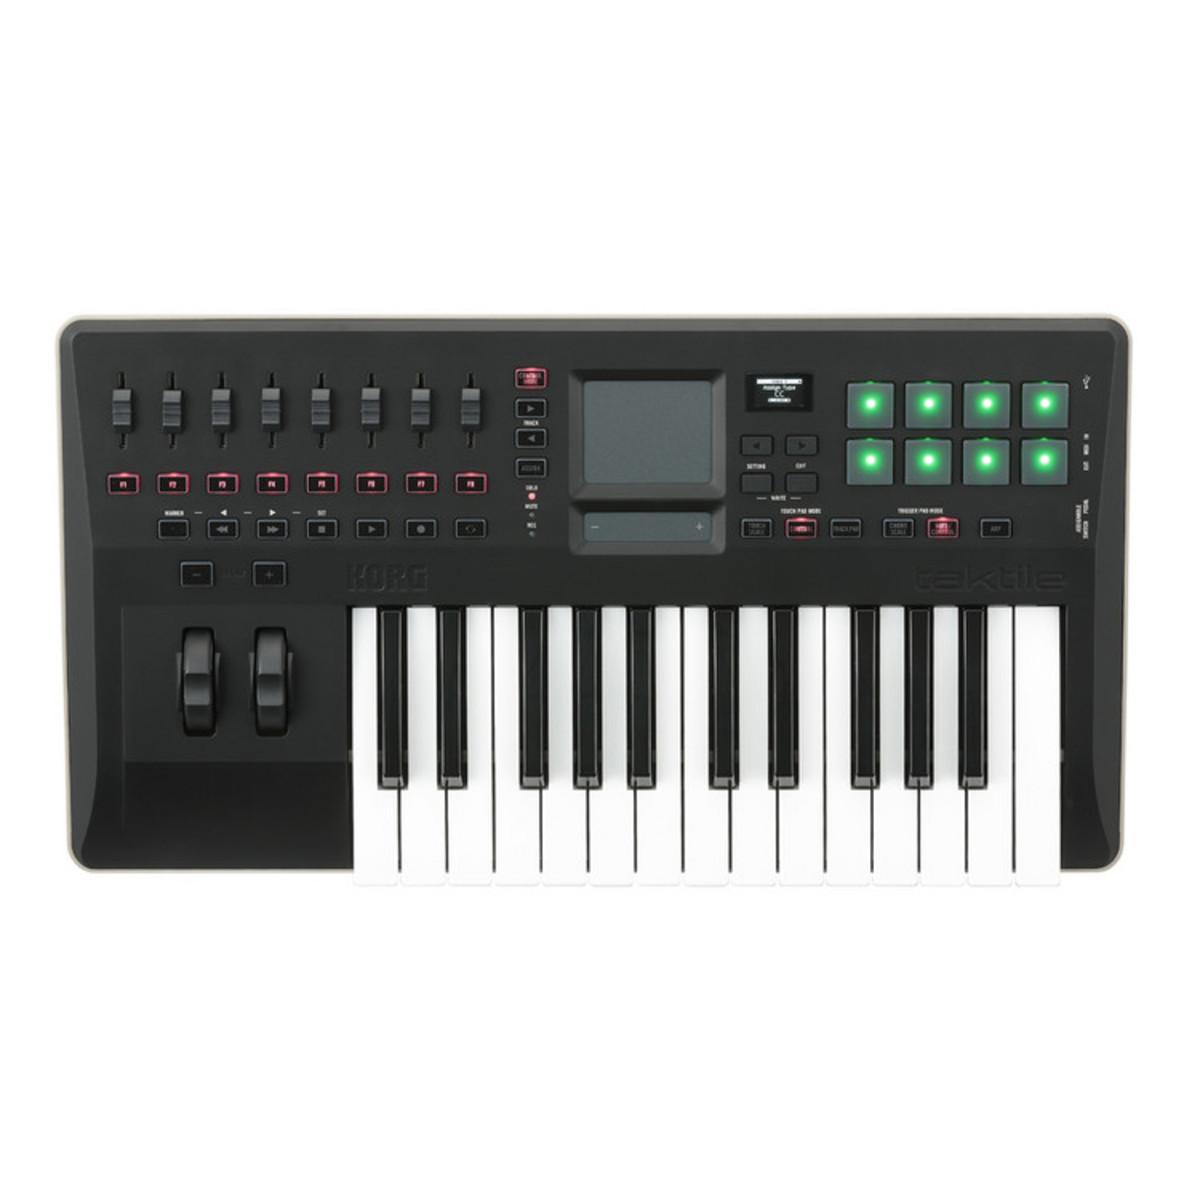 korg taktile 25 clavier contr leur usb midi 25 touches comme neuf gear4music. Black Bedroom Furniture Sets. Home Design Ideas